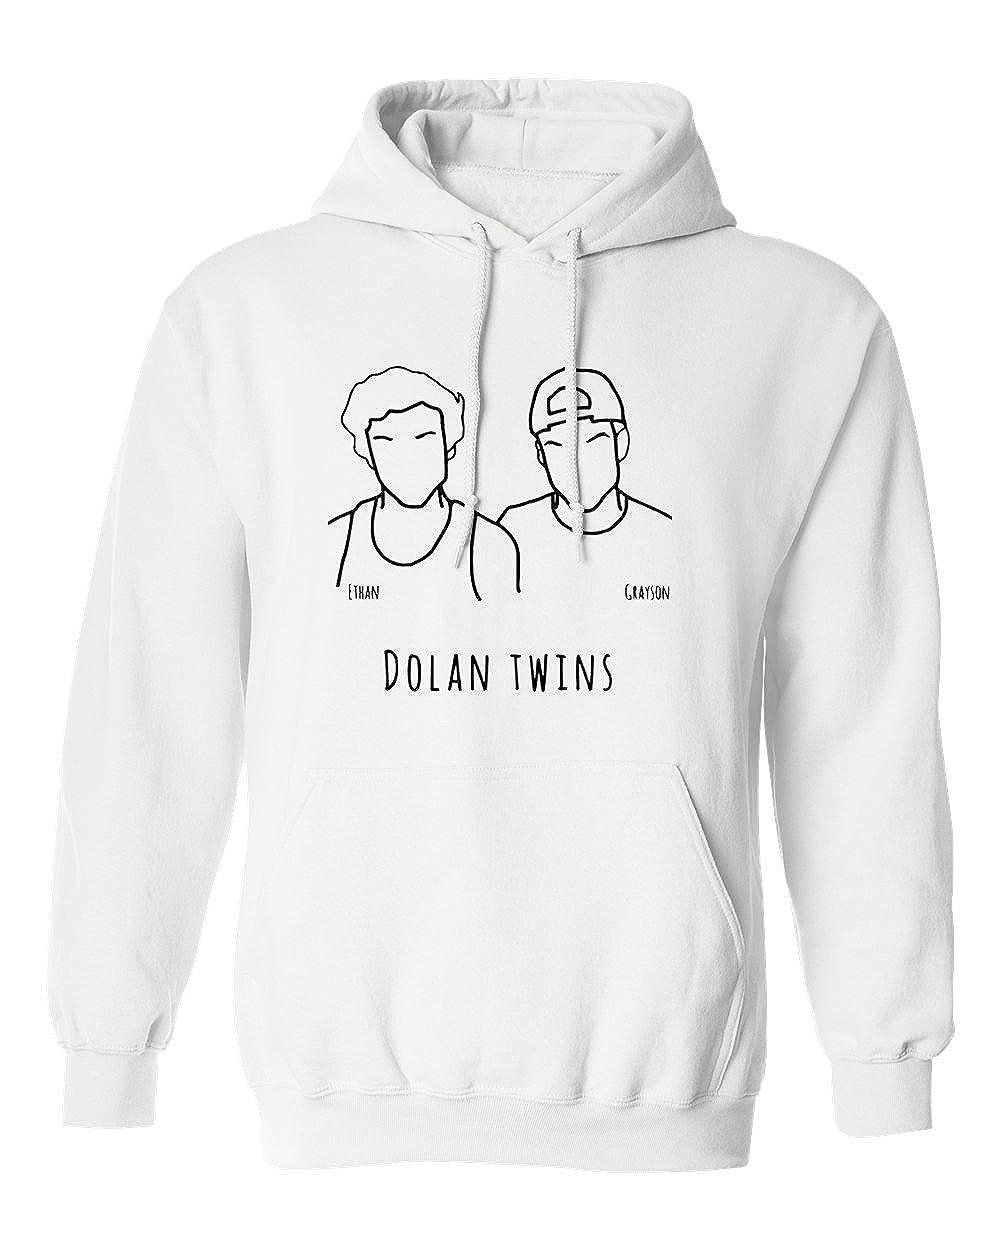 amazon sheki apparel dolan twins mens hoodie hooded sweatshirt Terraria Twins Art amazon sheki apparel dolan twins mens hoodie hooded sweatshirt clothing